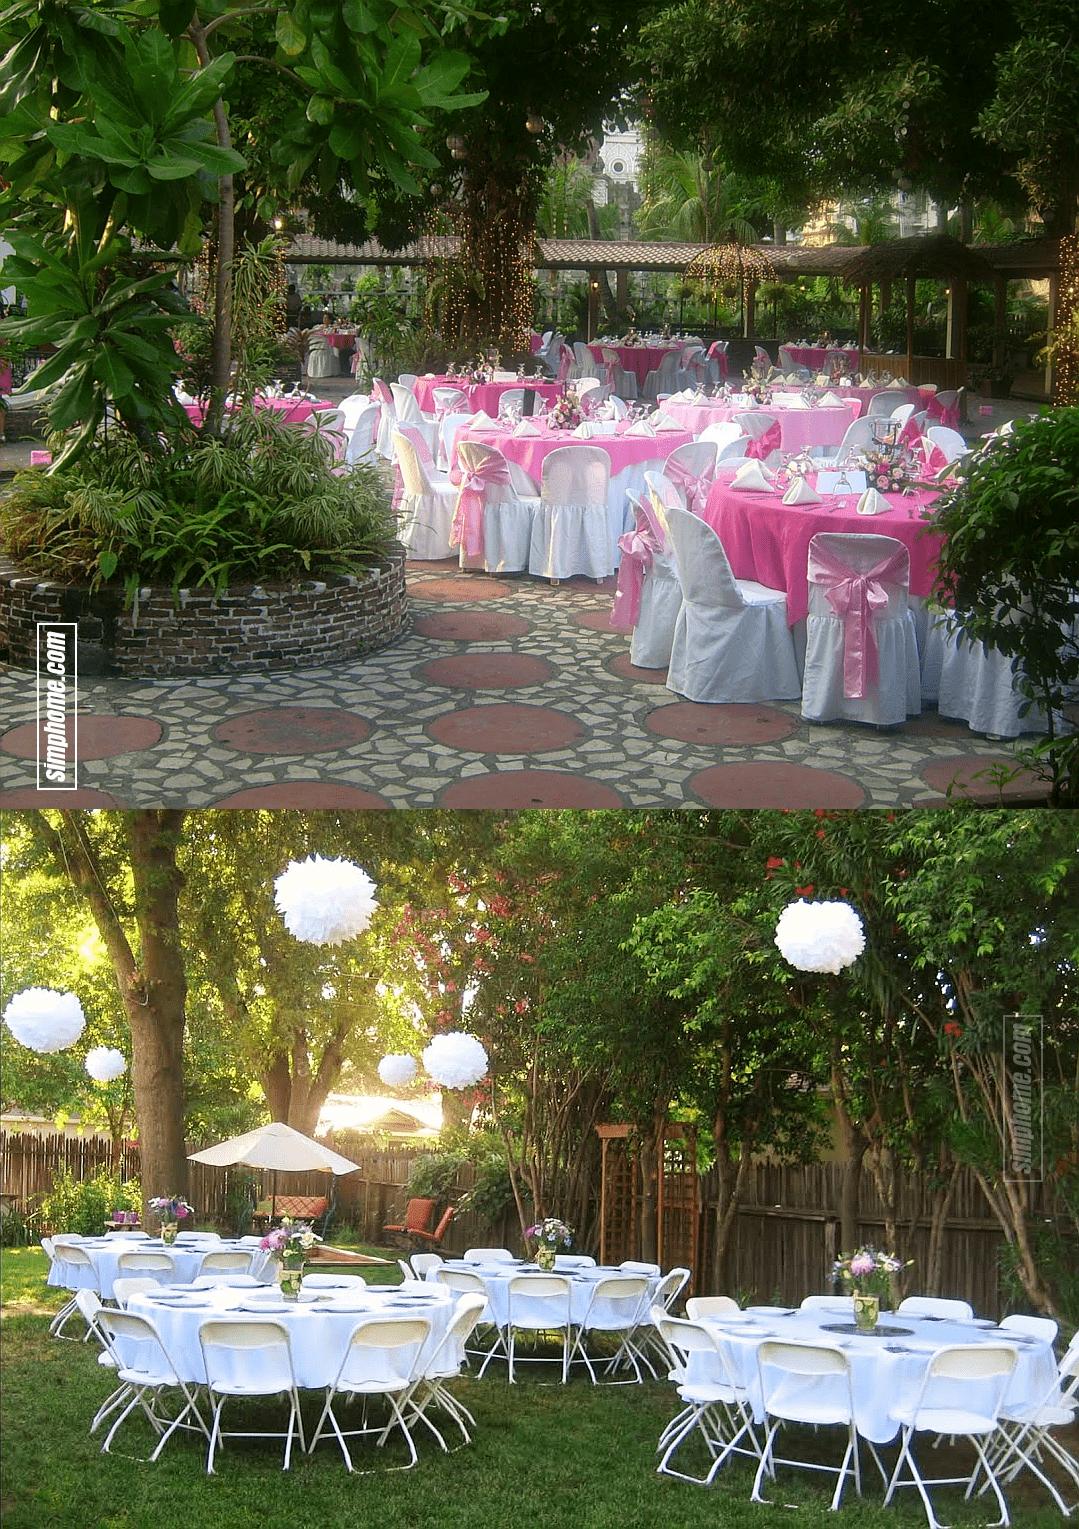 16.SIMPHOME.COM wedding ideas backyard wedding reception with Youtube reference